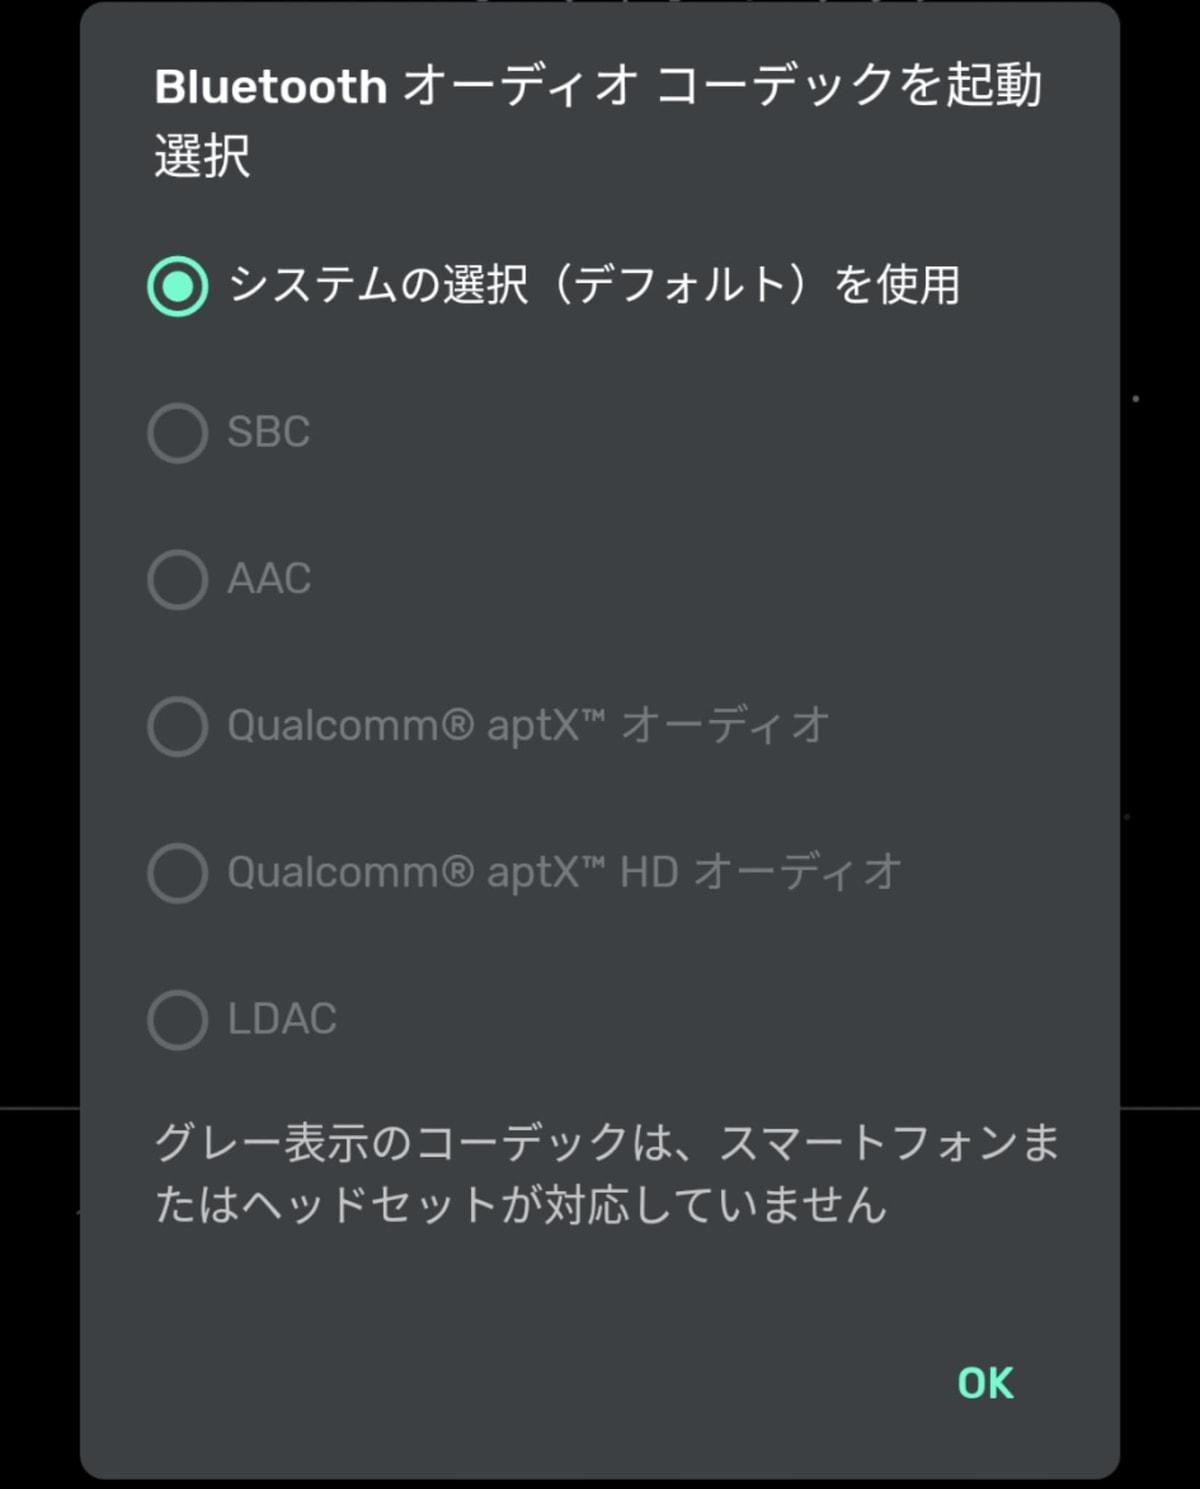 AndroidのBluetoothコーデックを確認する方法